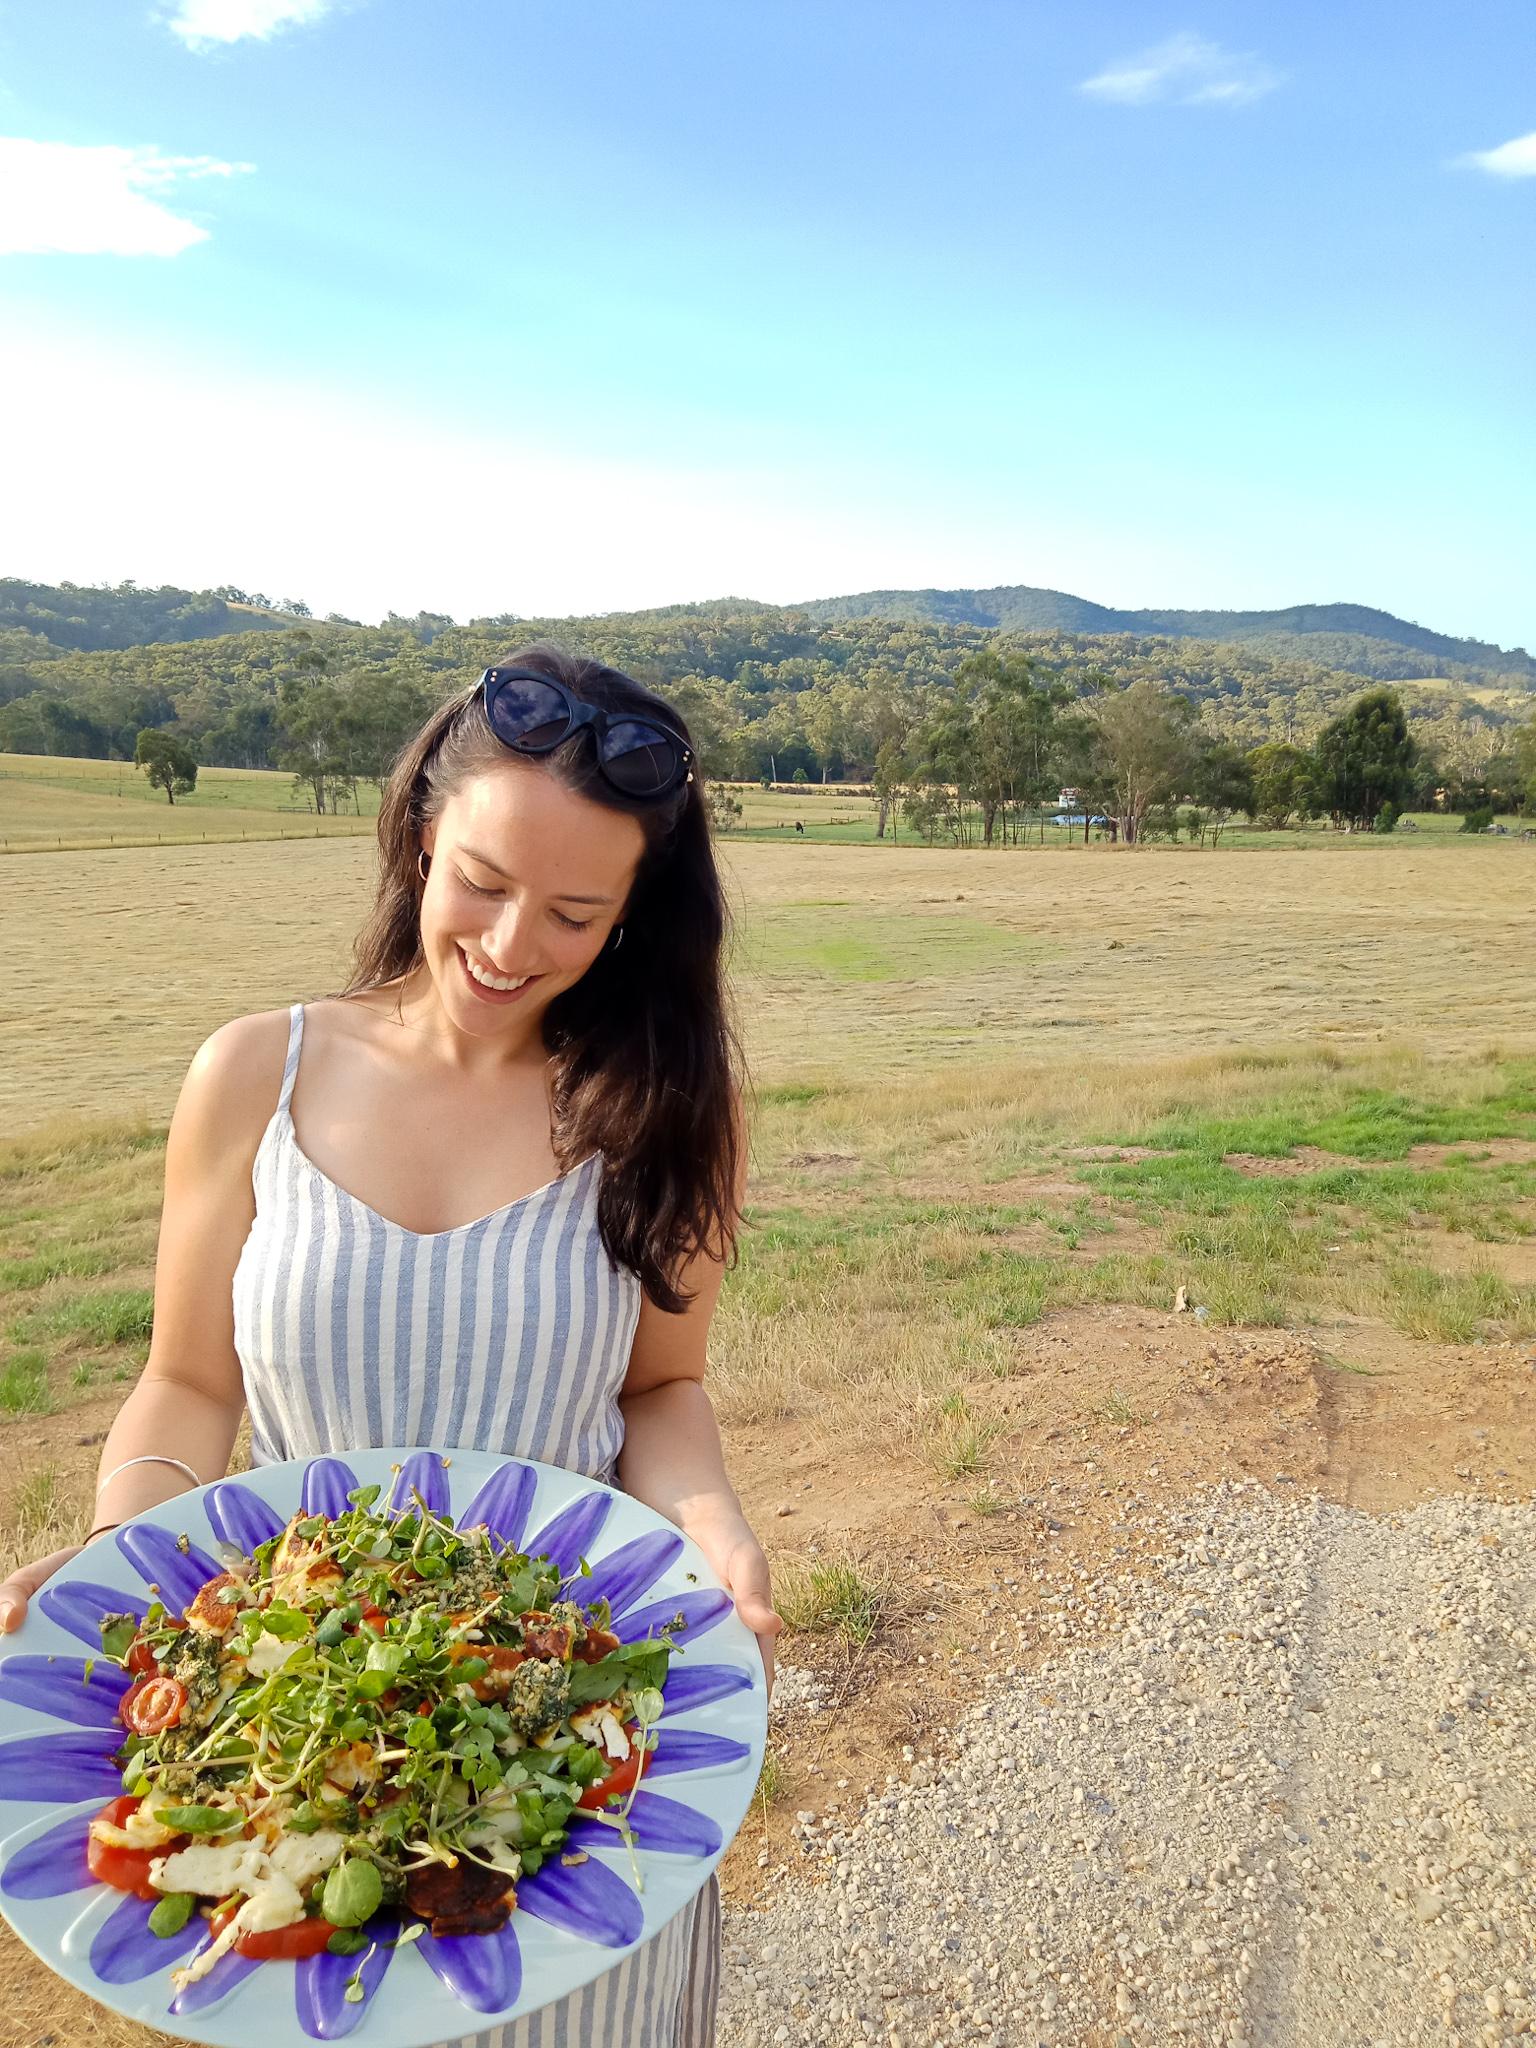 halloumi salad yarra valley melbourne